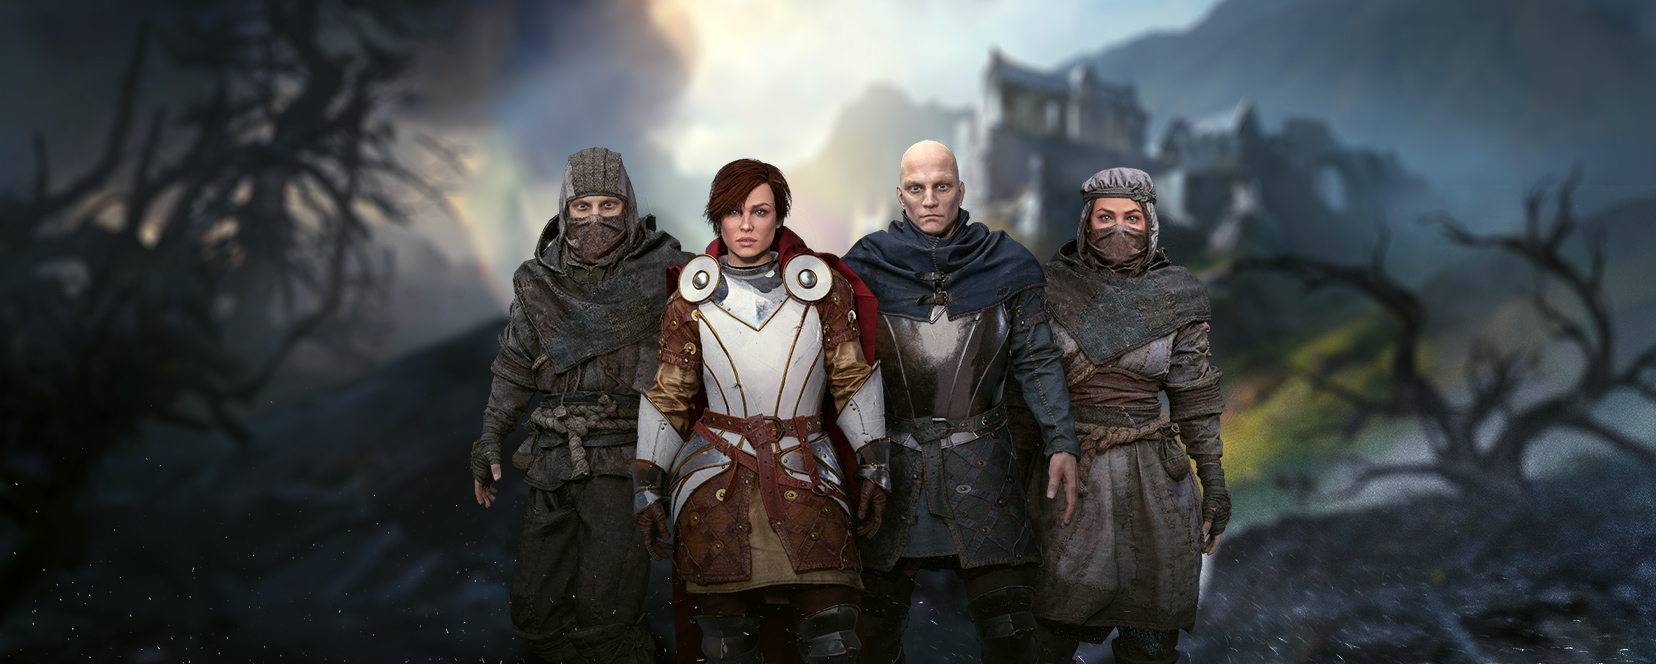 Character os Post Scriptum RPG as avatars for gaming social project Caer Sidi Hub